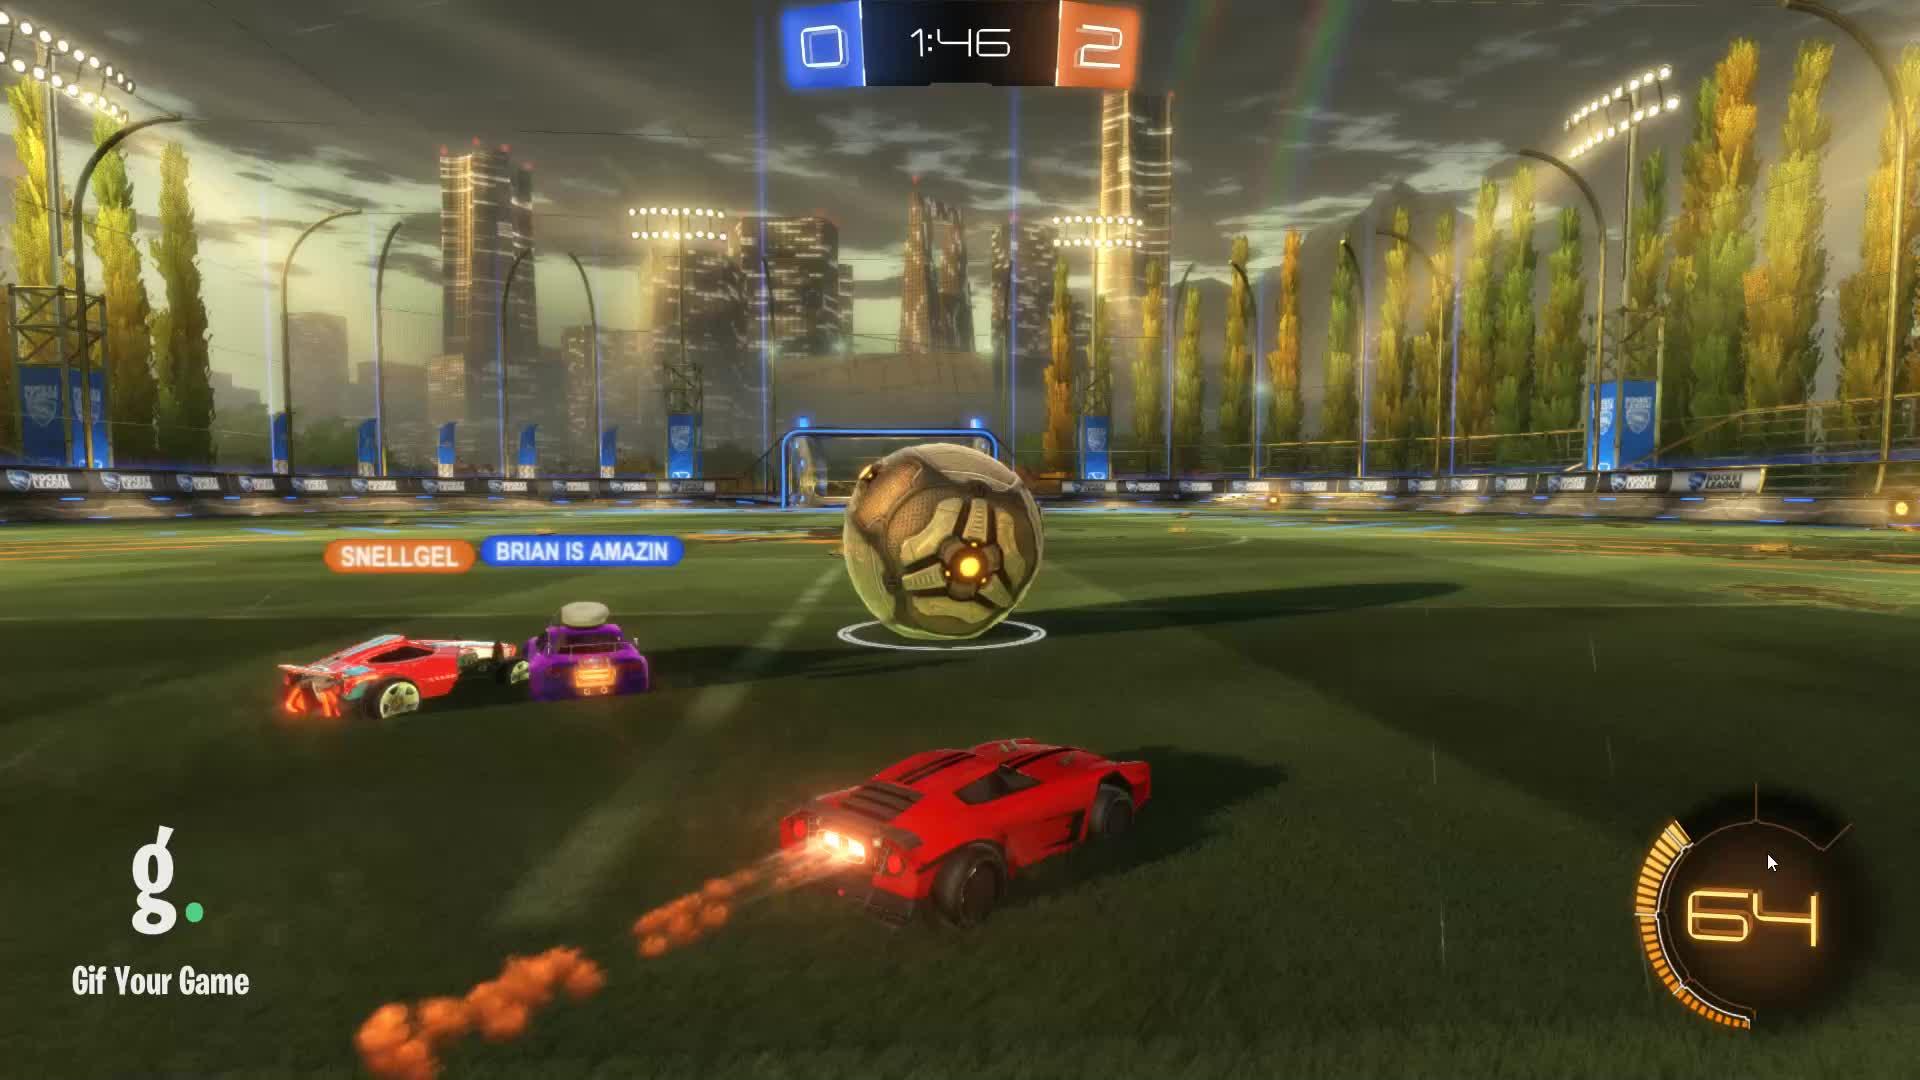 Gif Your Game, GifYourGame, Goal, Rocket League, RocketLeague, datboi, Goal 3: datboi GIFs